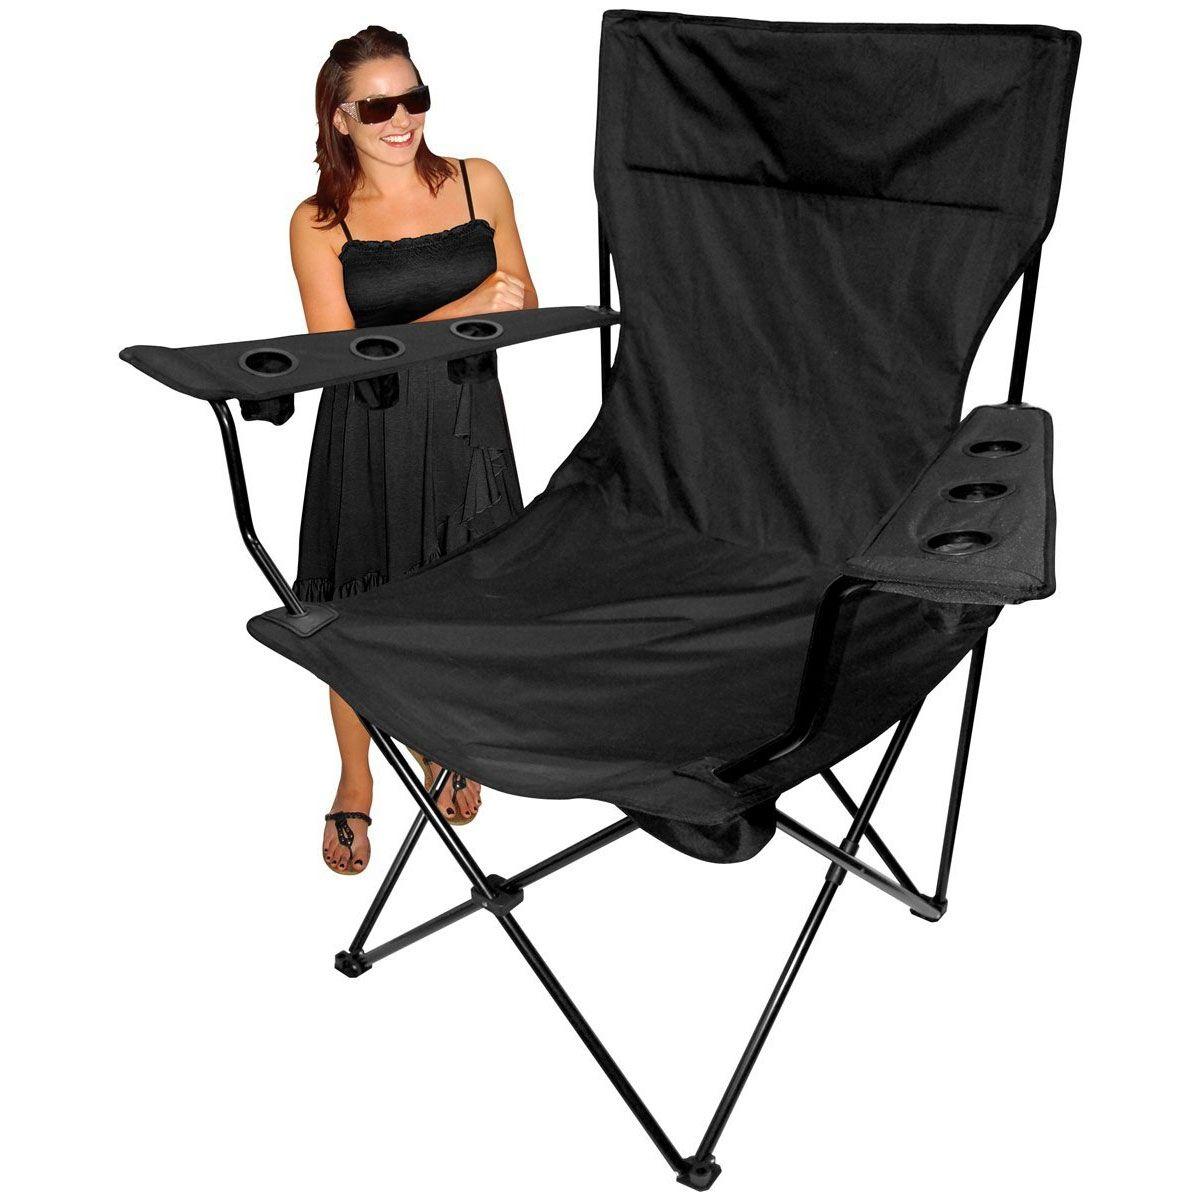 Super Big Man Folding Beach Chair Folding Beach Chair Camping Dailytribune Chair Design For Home Dailytribuneorg